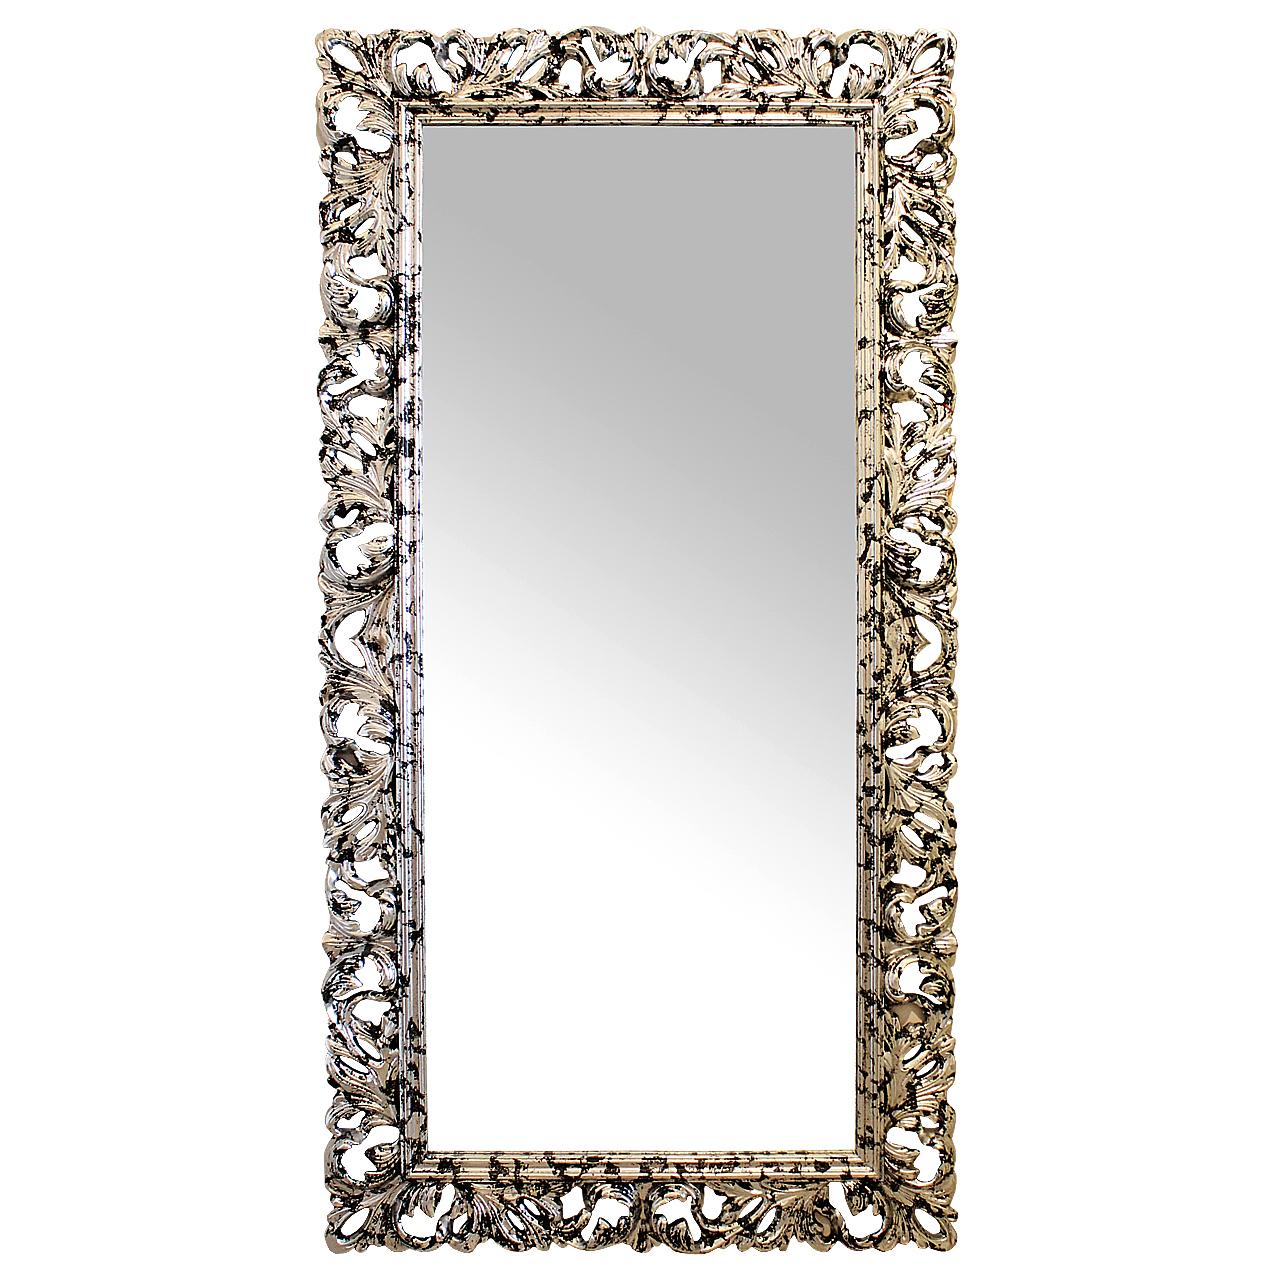 Oglinda Retro Din Polirasina Argintiu Cu Negru